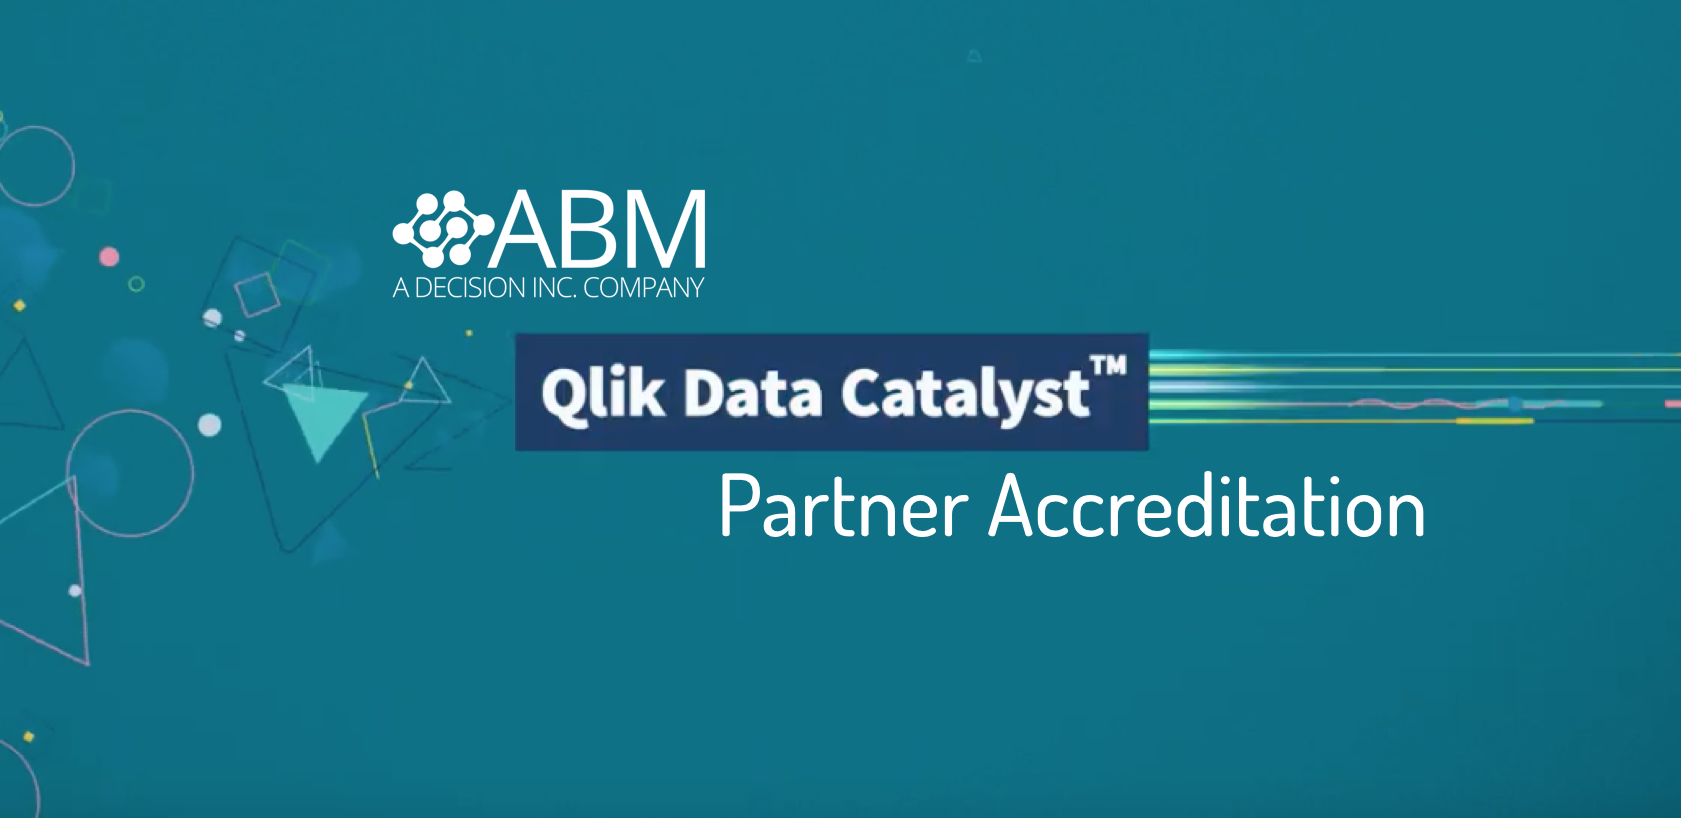 ABM Systems Qlik Data Catalyst Partner Accreditation